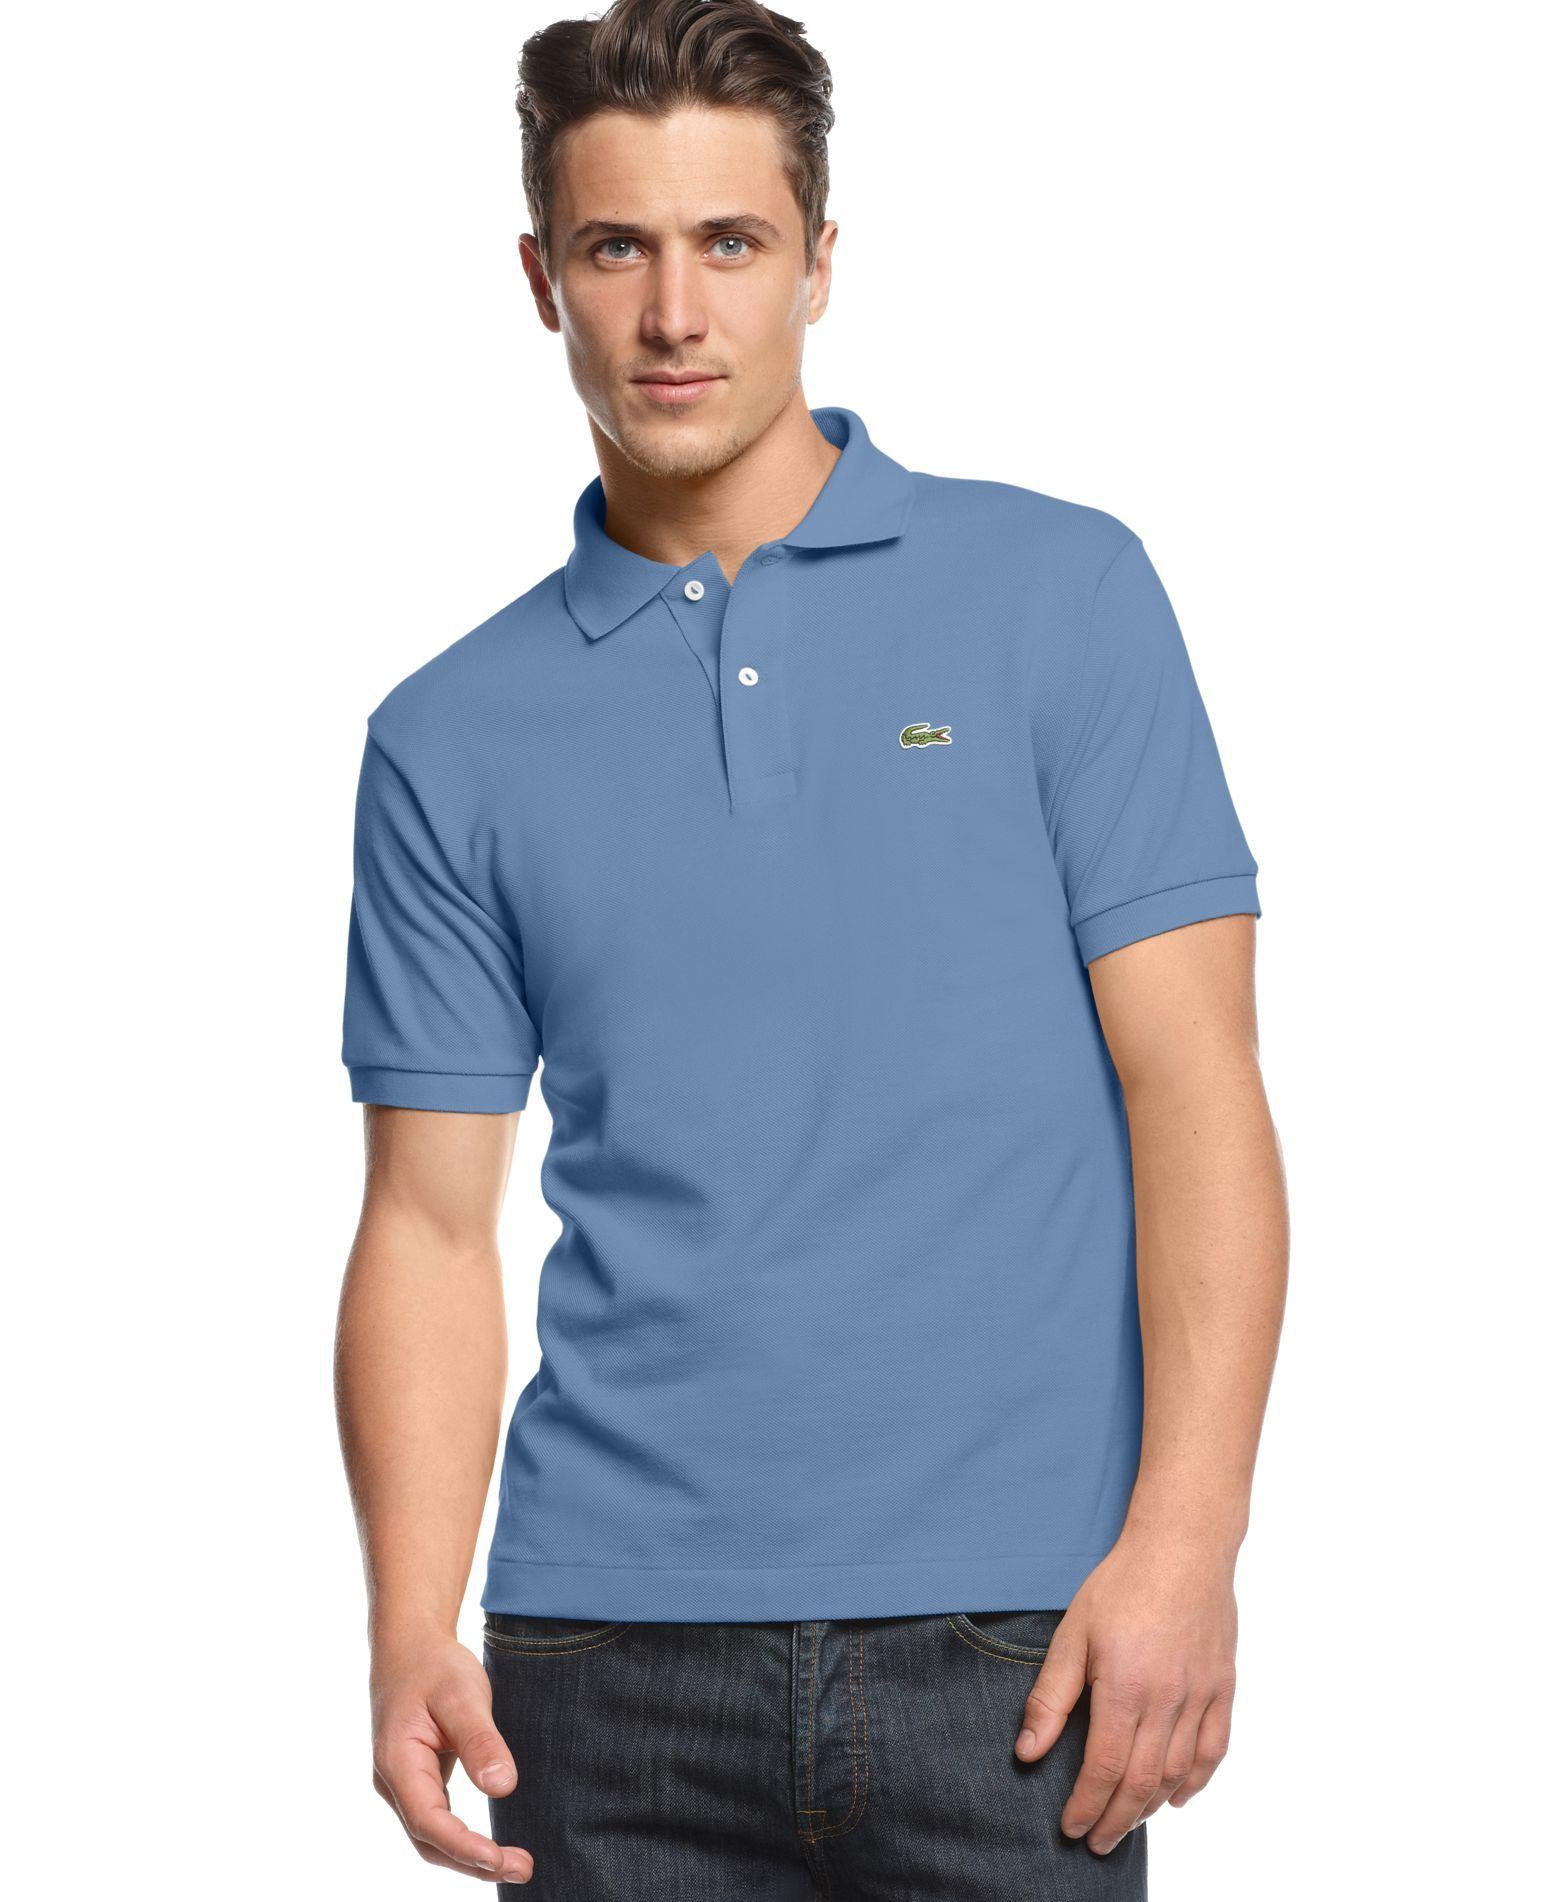 Flannel shirt with shorts men  Perry Ellis Menus Premium Leather Sheridan Bifold Wallet  Shops